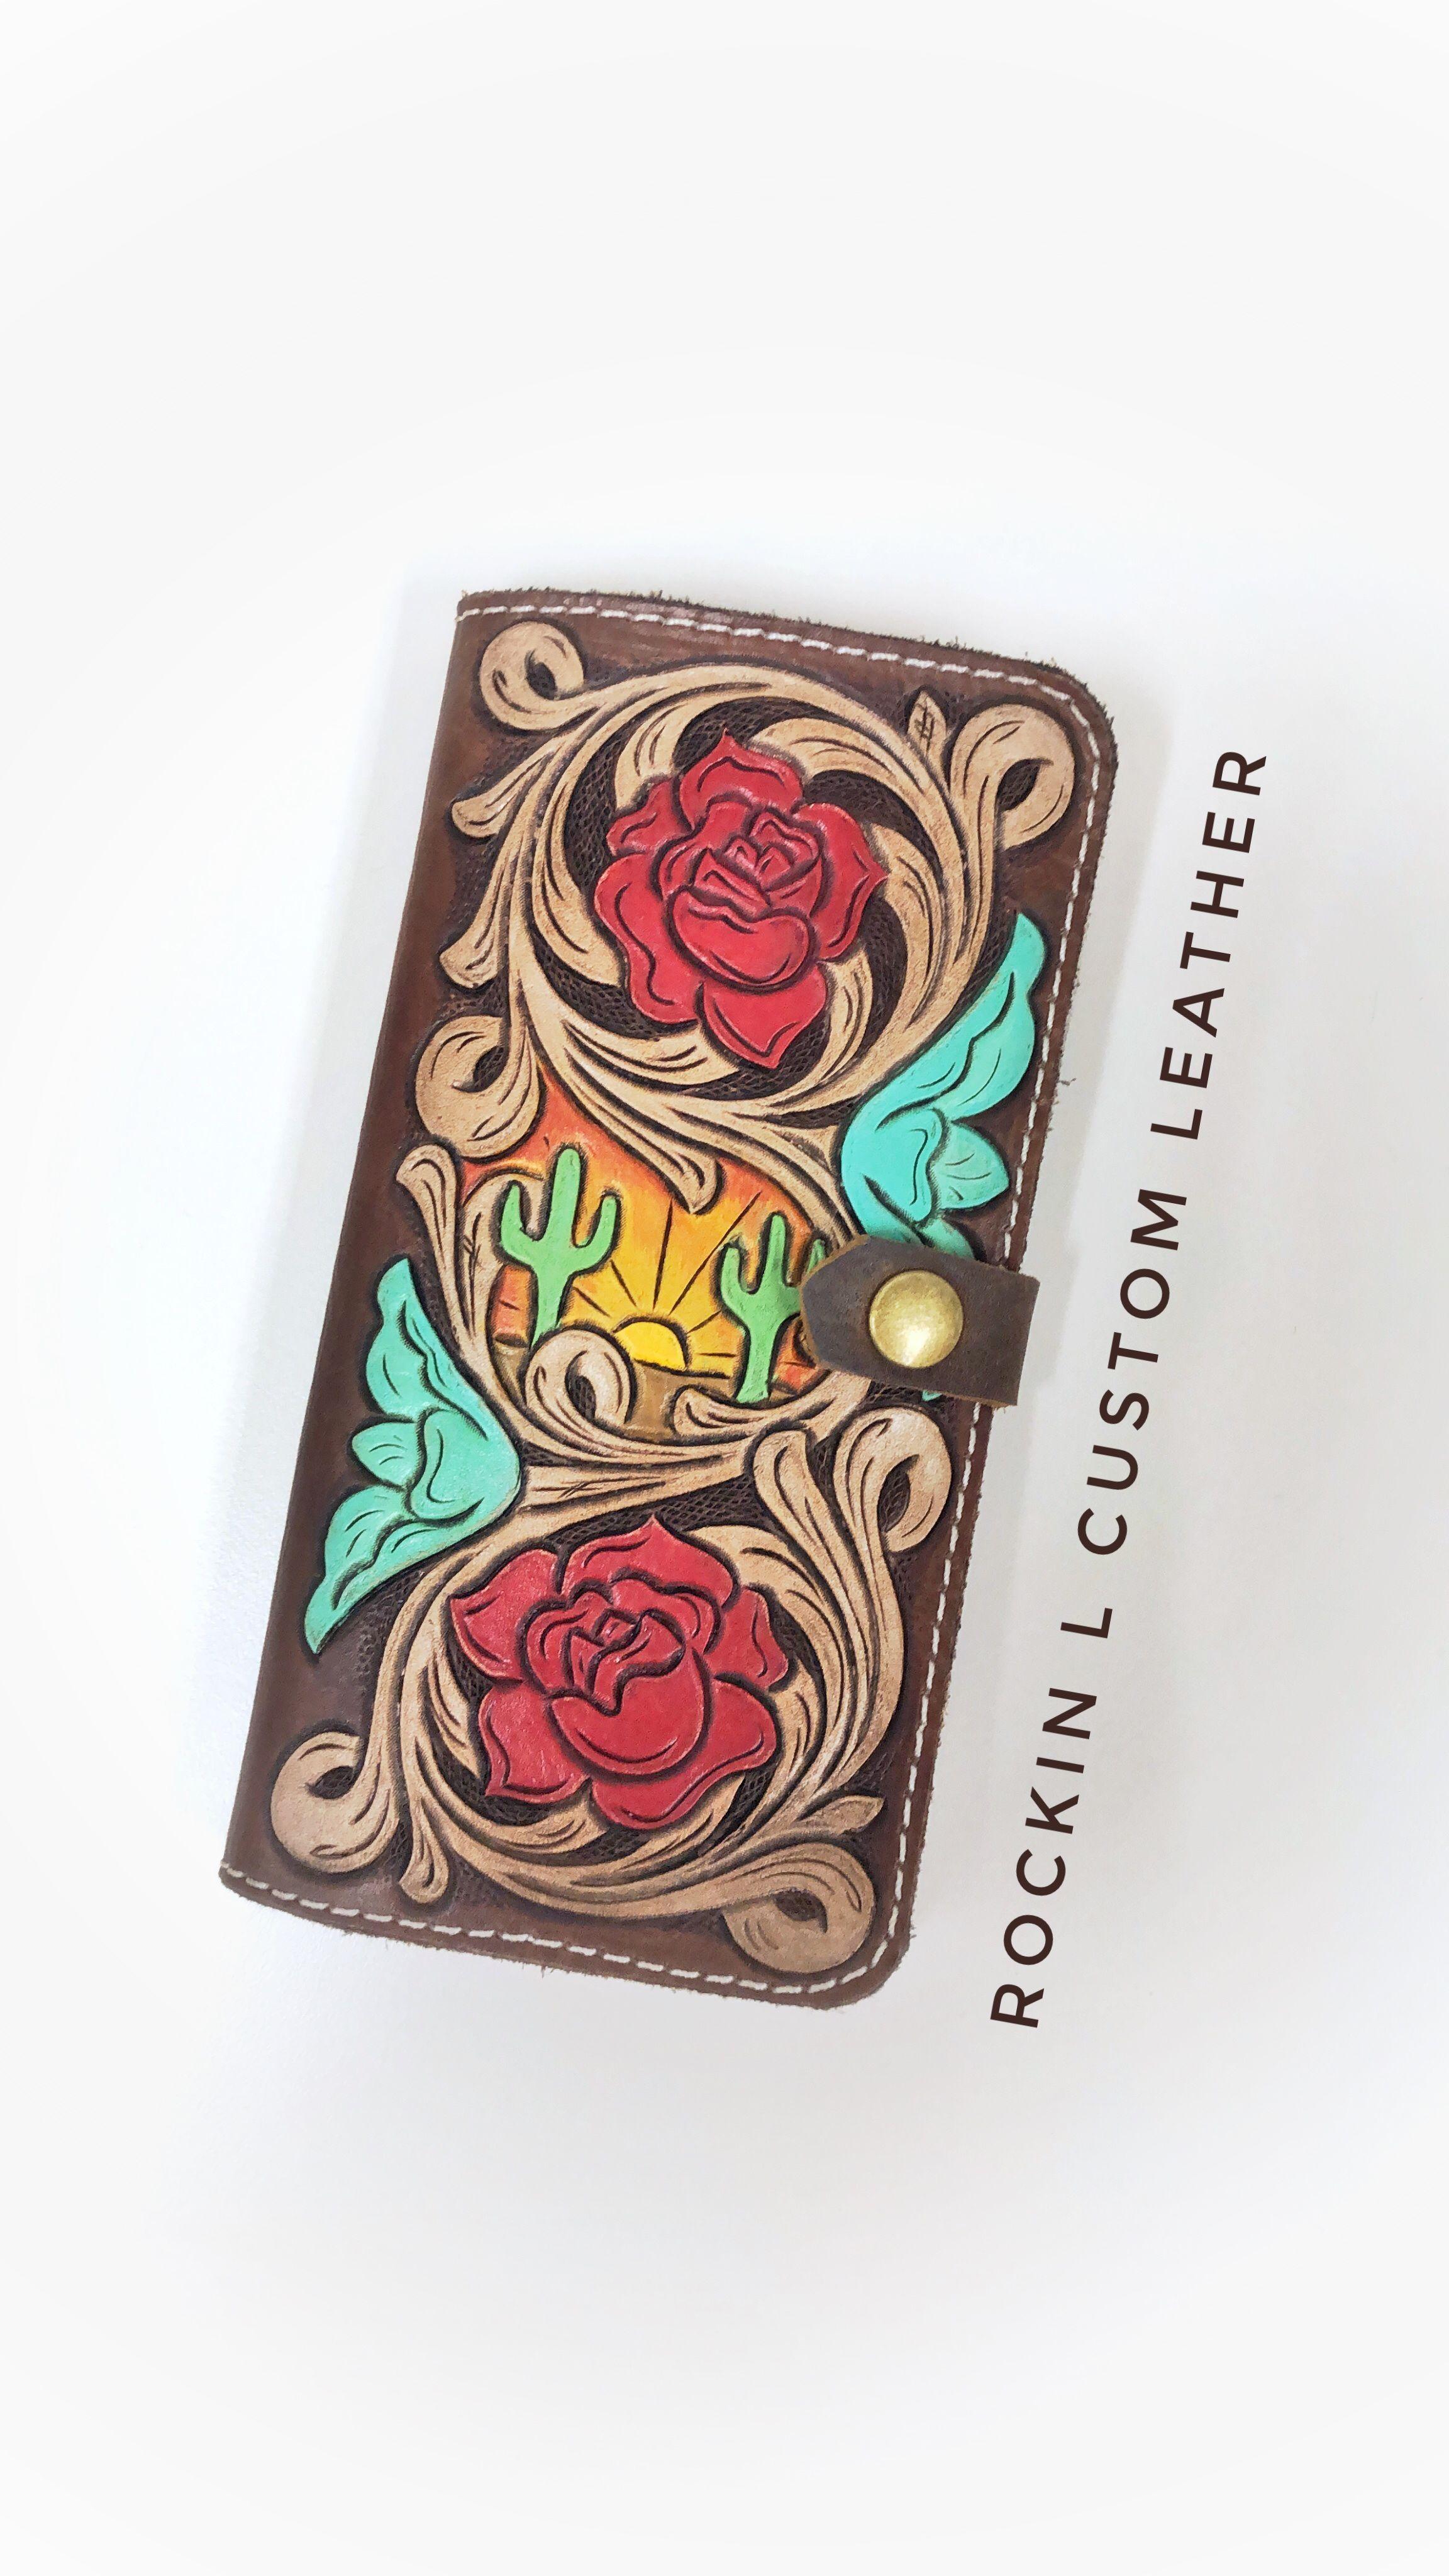 newest 2ed88 89058 Custom tooled leather phone case made by Rockin L Custom Leather ...